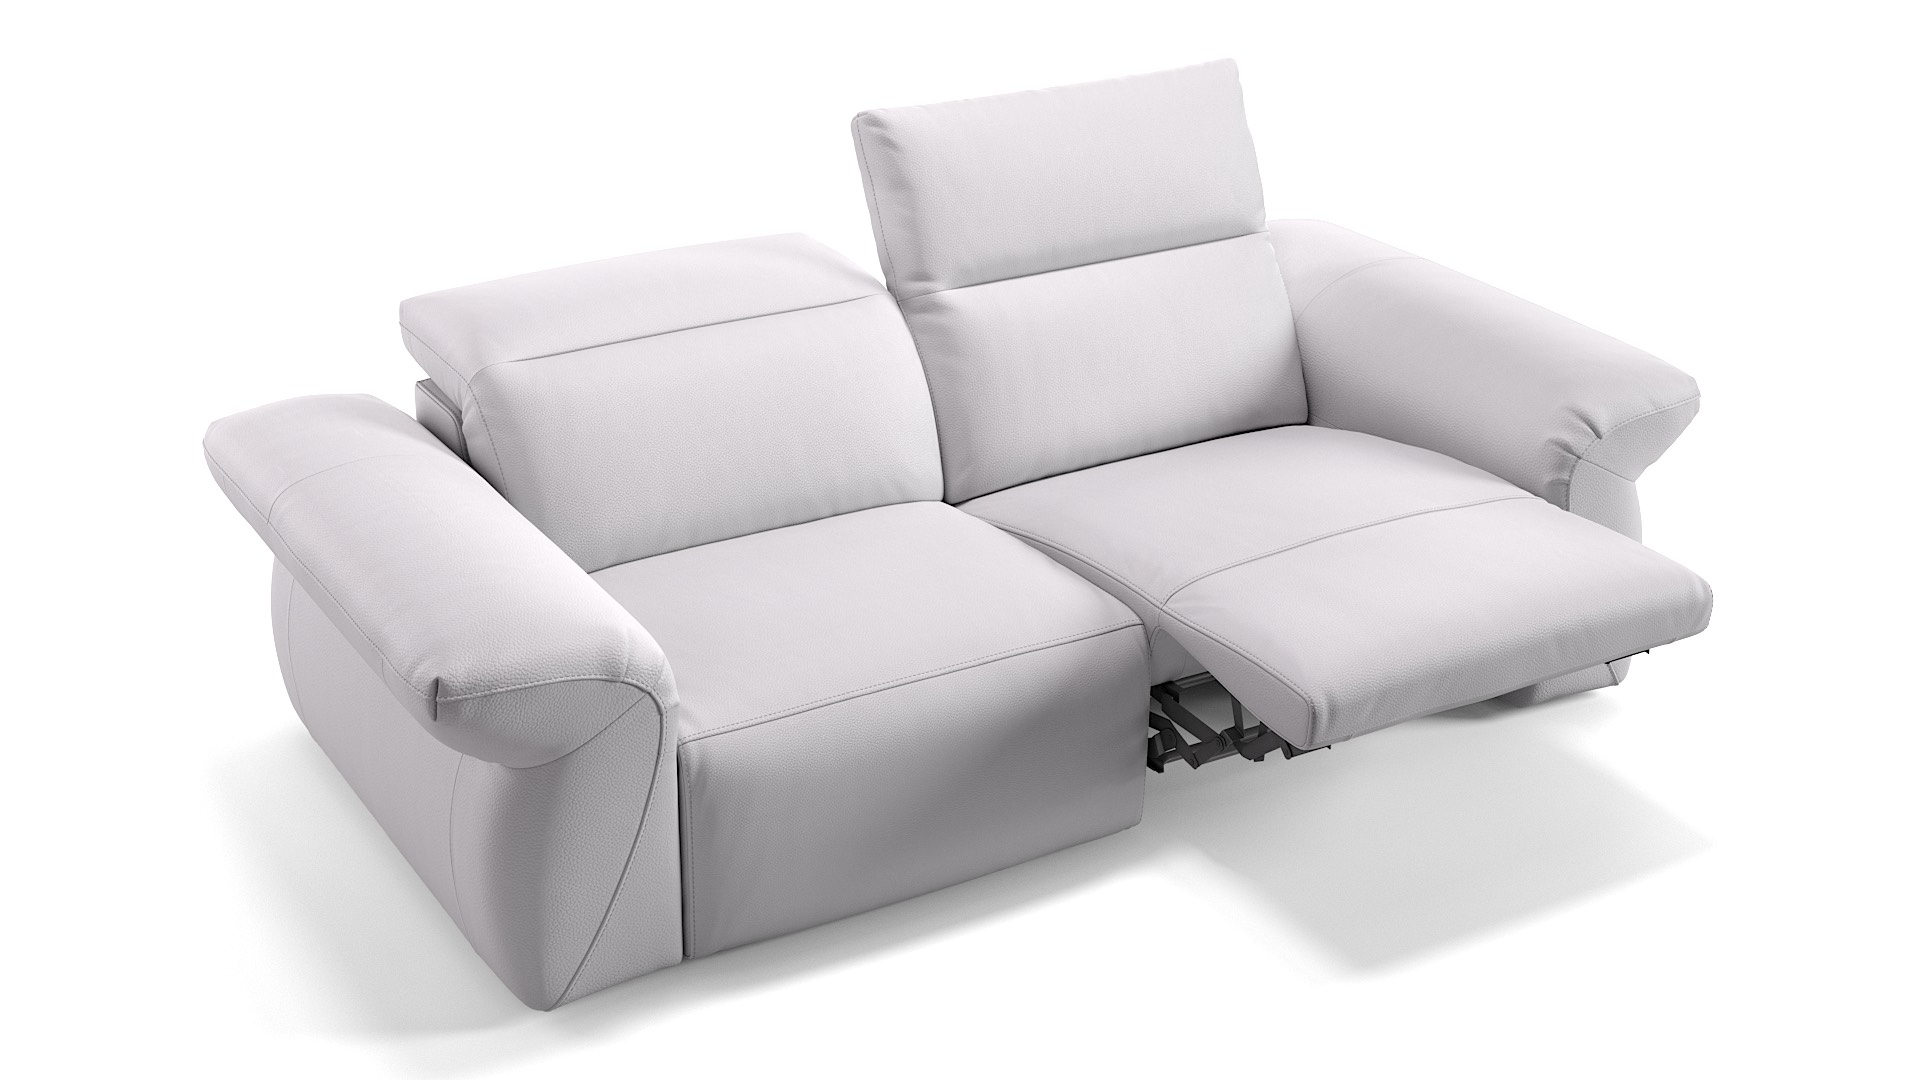 Full Size of Design Couch Kaufen Ledersofa Gnstig Sofanella Chesterfield Sofa Luxus Samt Led Big Leder In L Form Gebraucht Günstig Schlafzimmer Set De Sede Chippendale Sofa Xxl Sofa Günstig